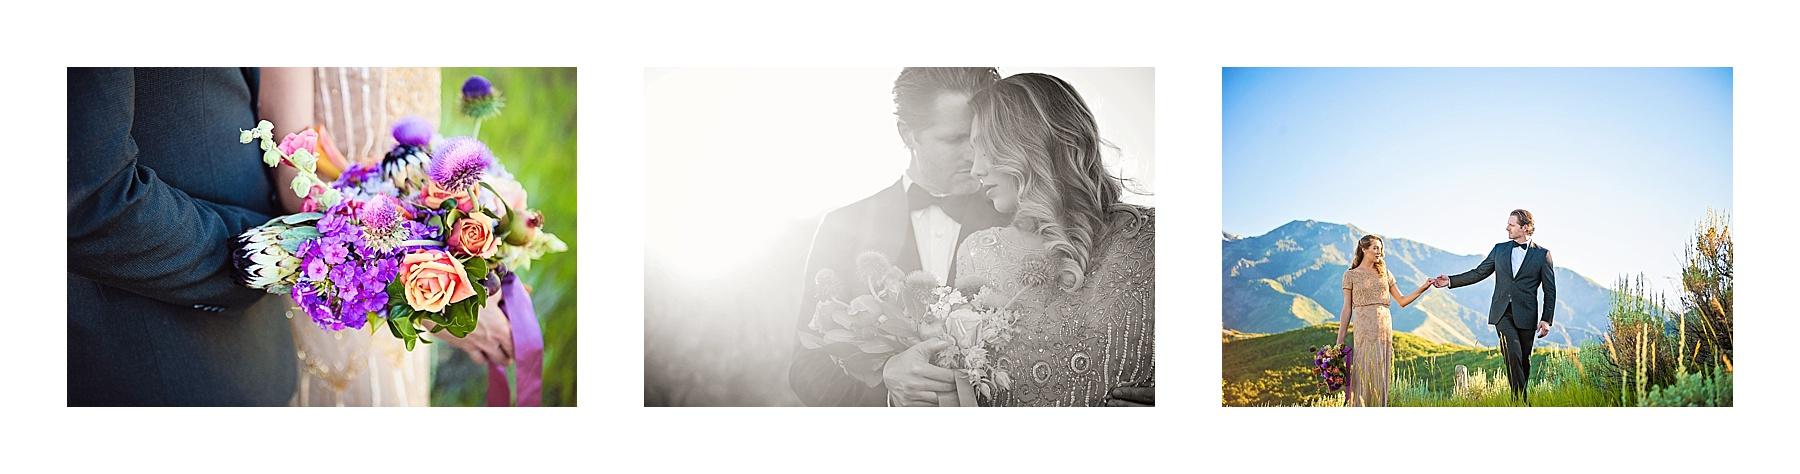 Romantic-Anniversary-Session_0720.jpg